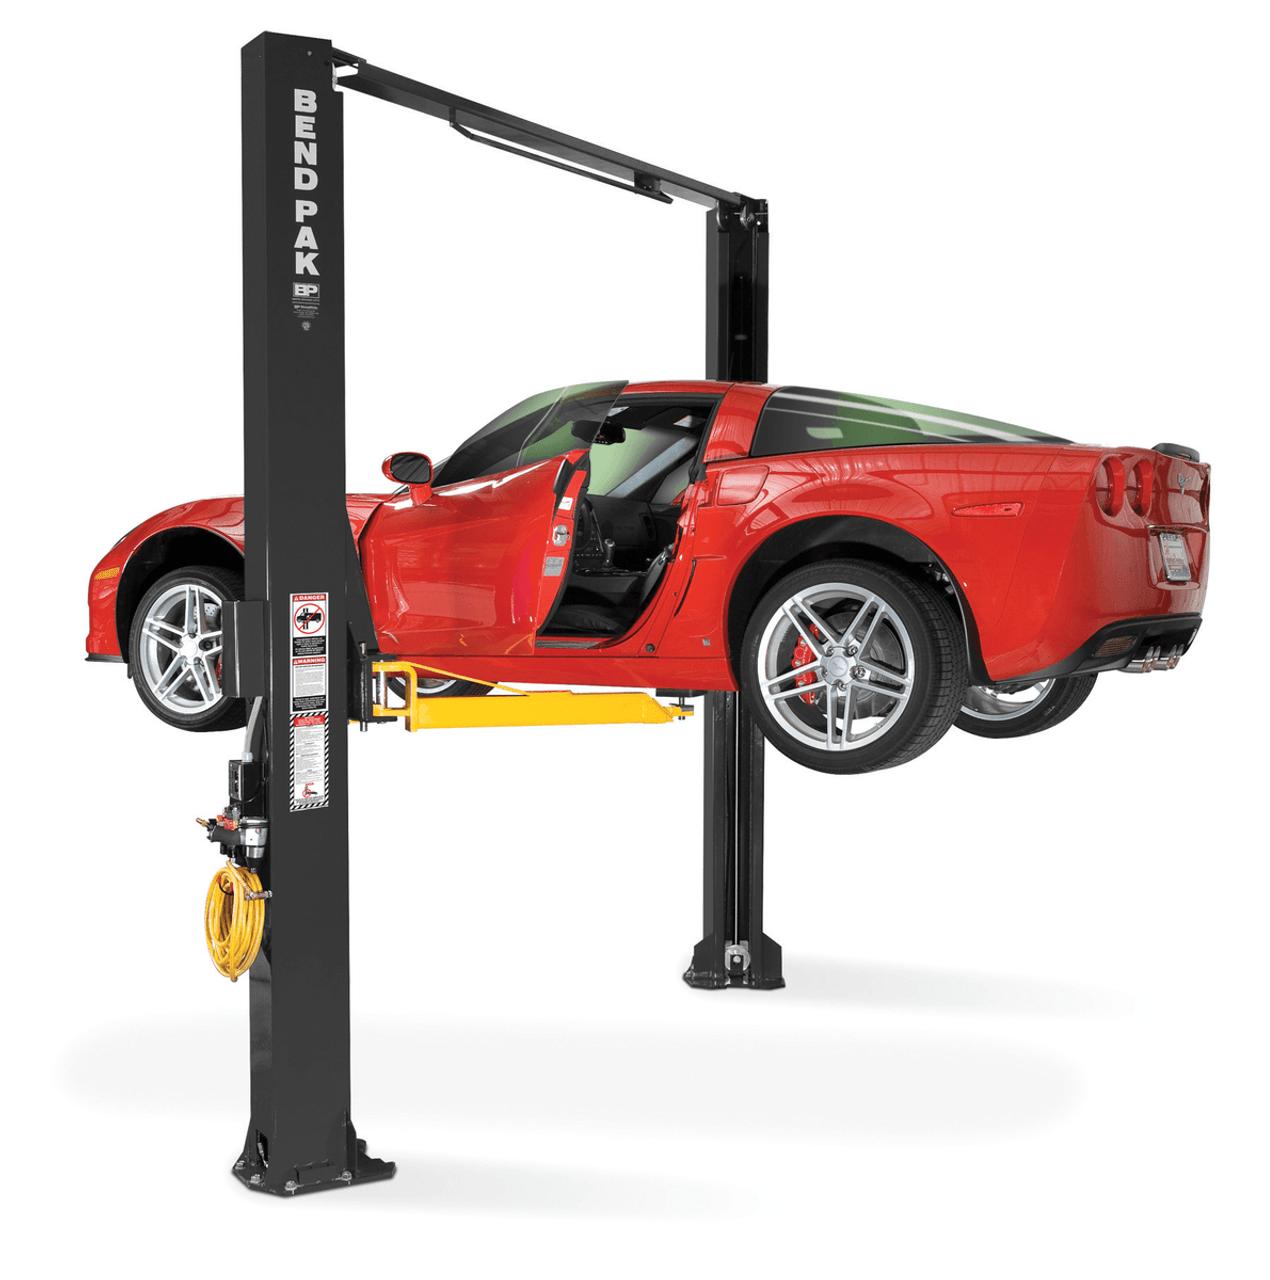 10000 Lb Car Lift >> Bendpak XPR-10AS-LP Dual-Width, 10,000 Lb. Low Profile Clearfloor 2 Post Car Lift